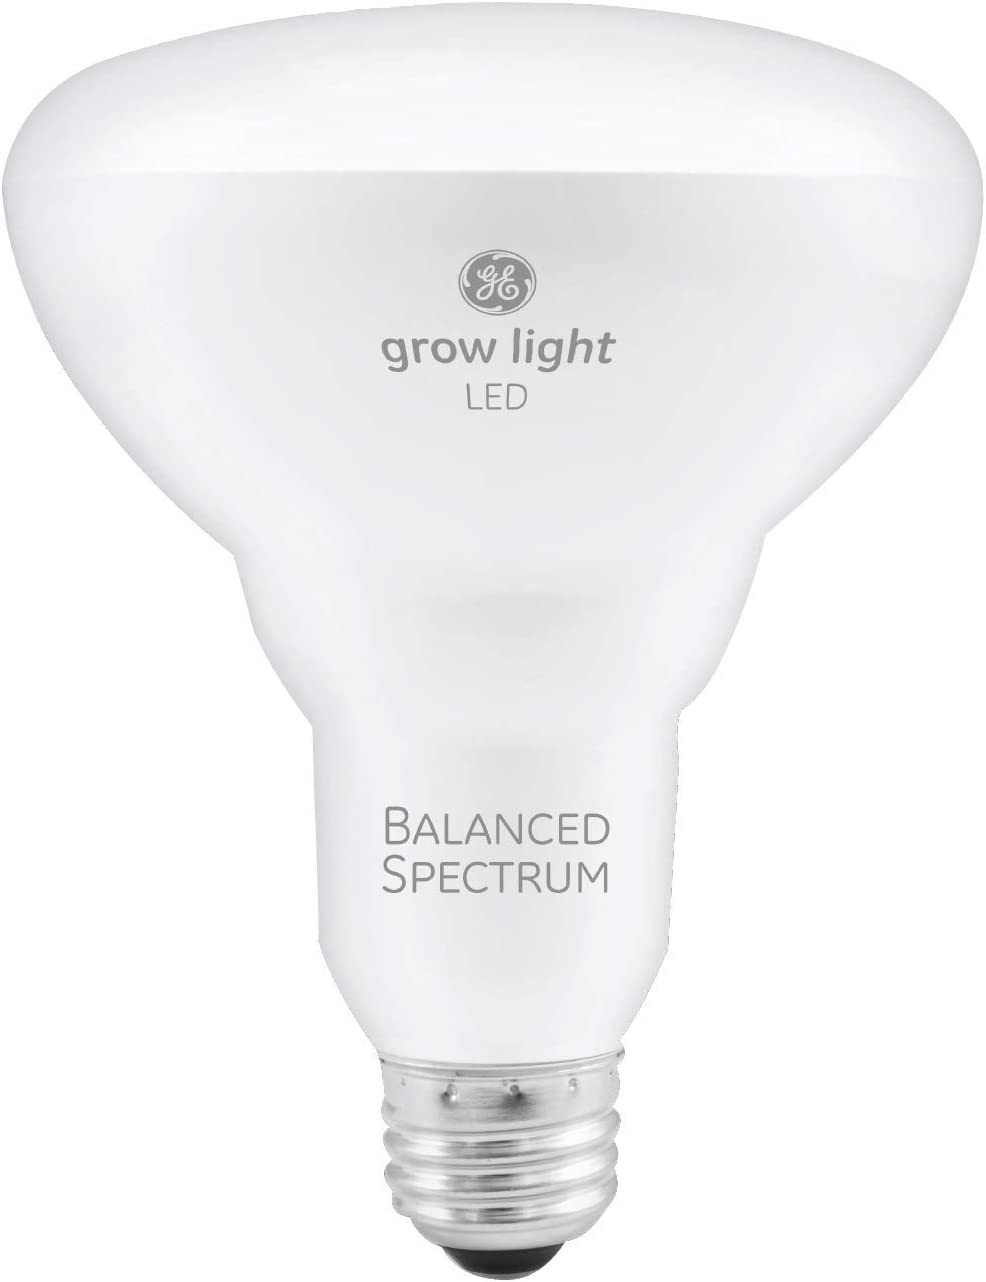 GE Lighting 93101230 9-Watt Horticultural LED Grow Light, BR30, Balanced Spectrum (Renewed)